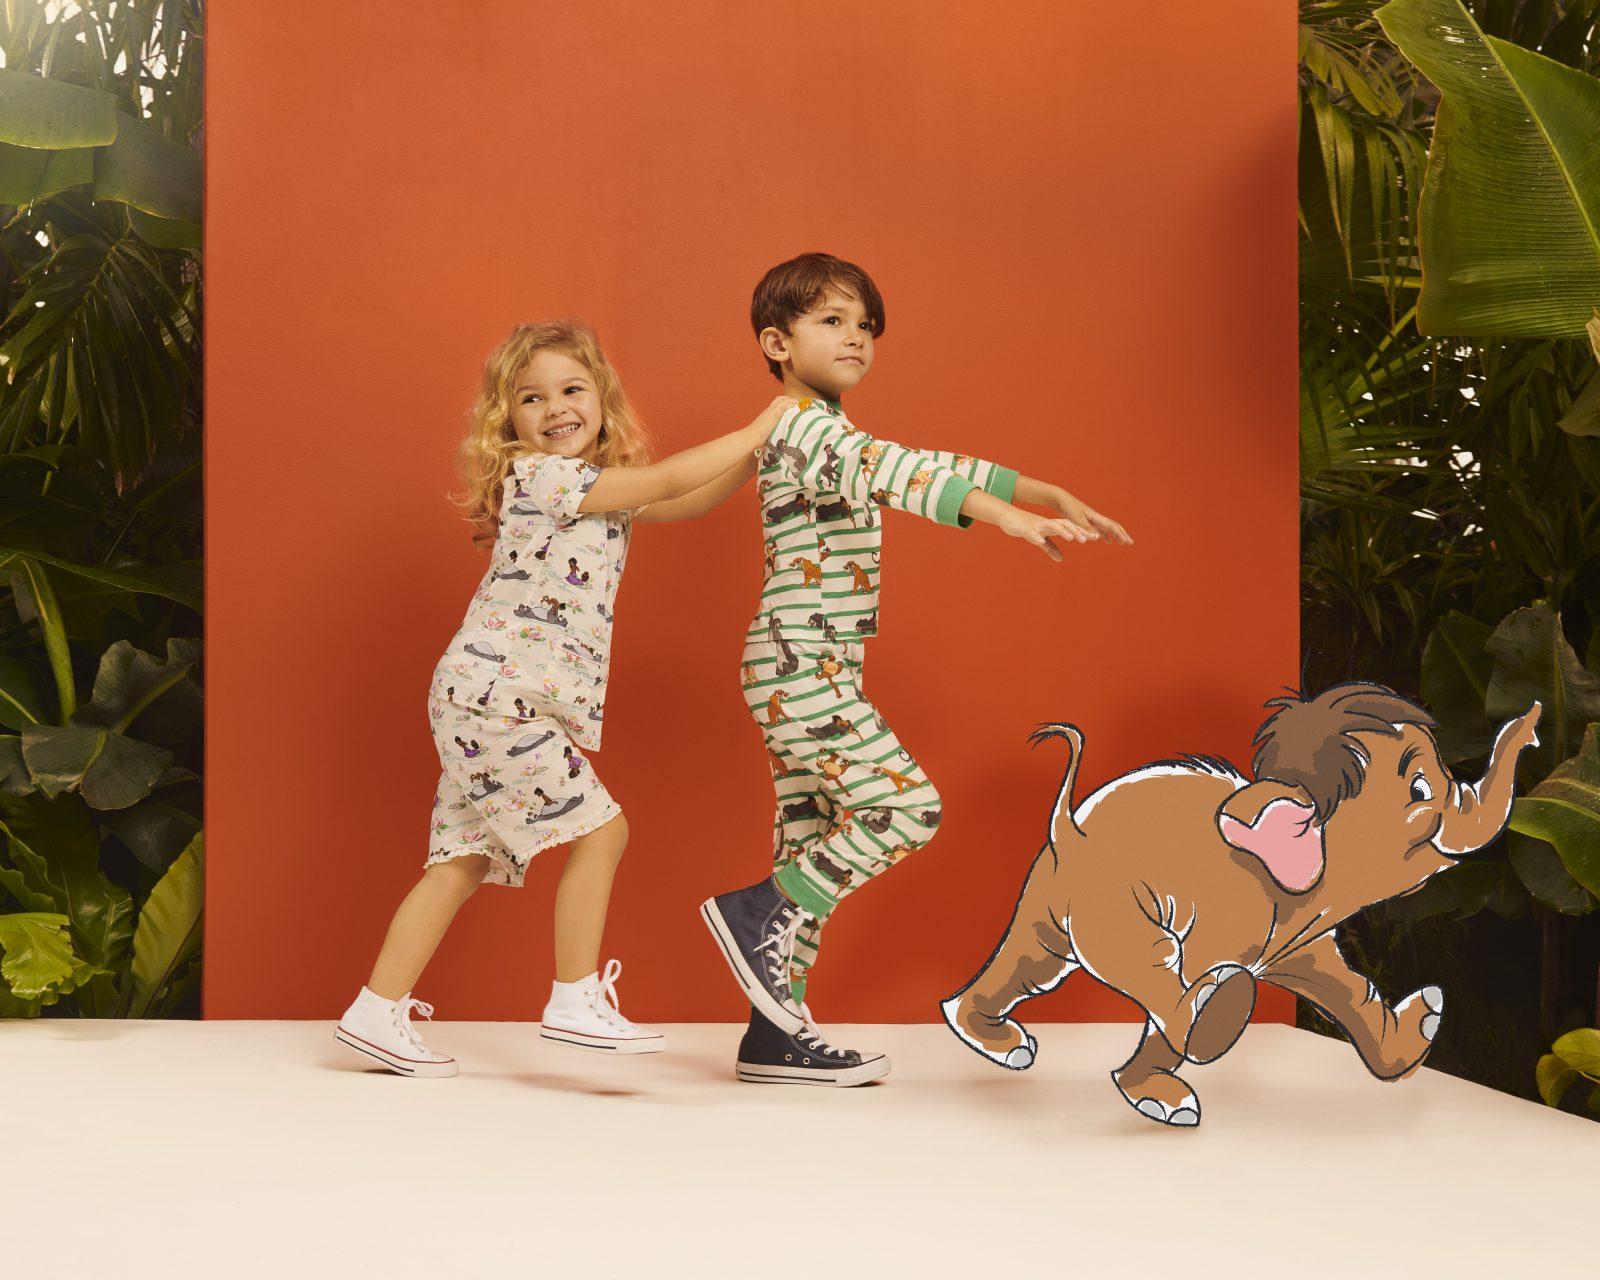 Disney Jungle Book x Cath Kidston